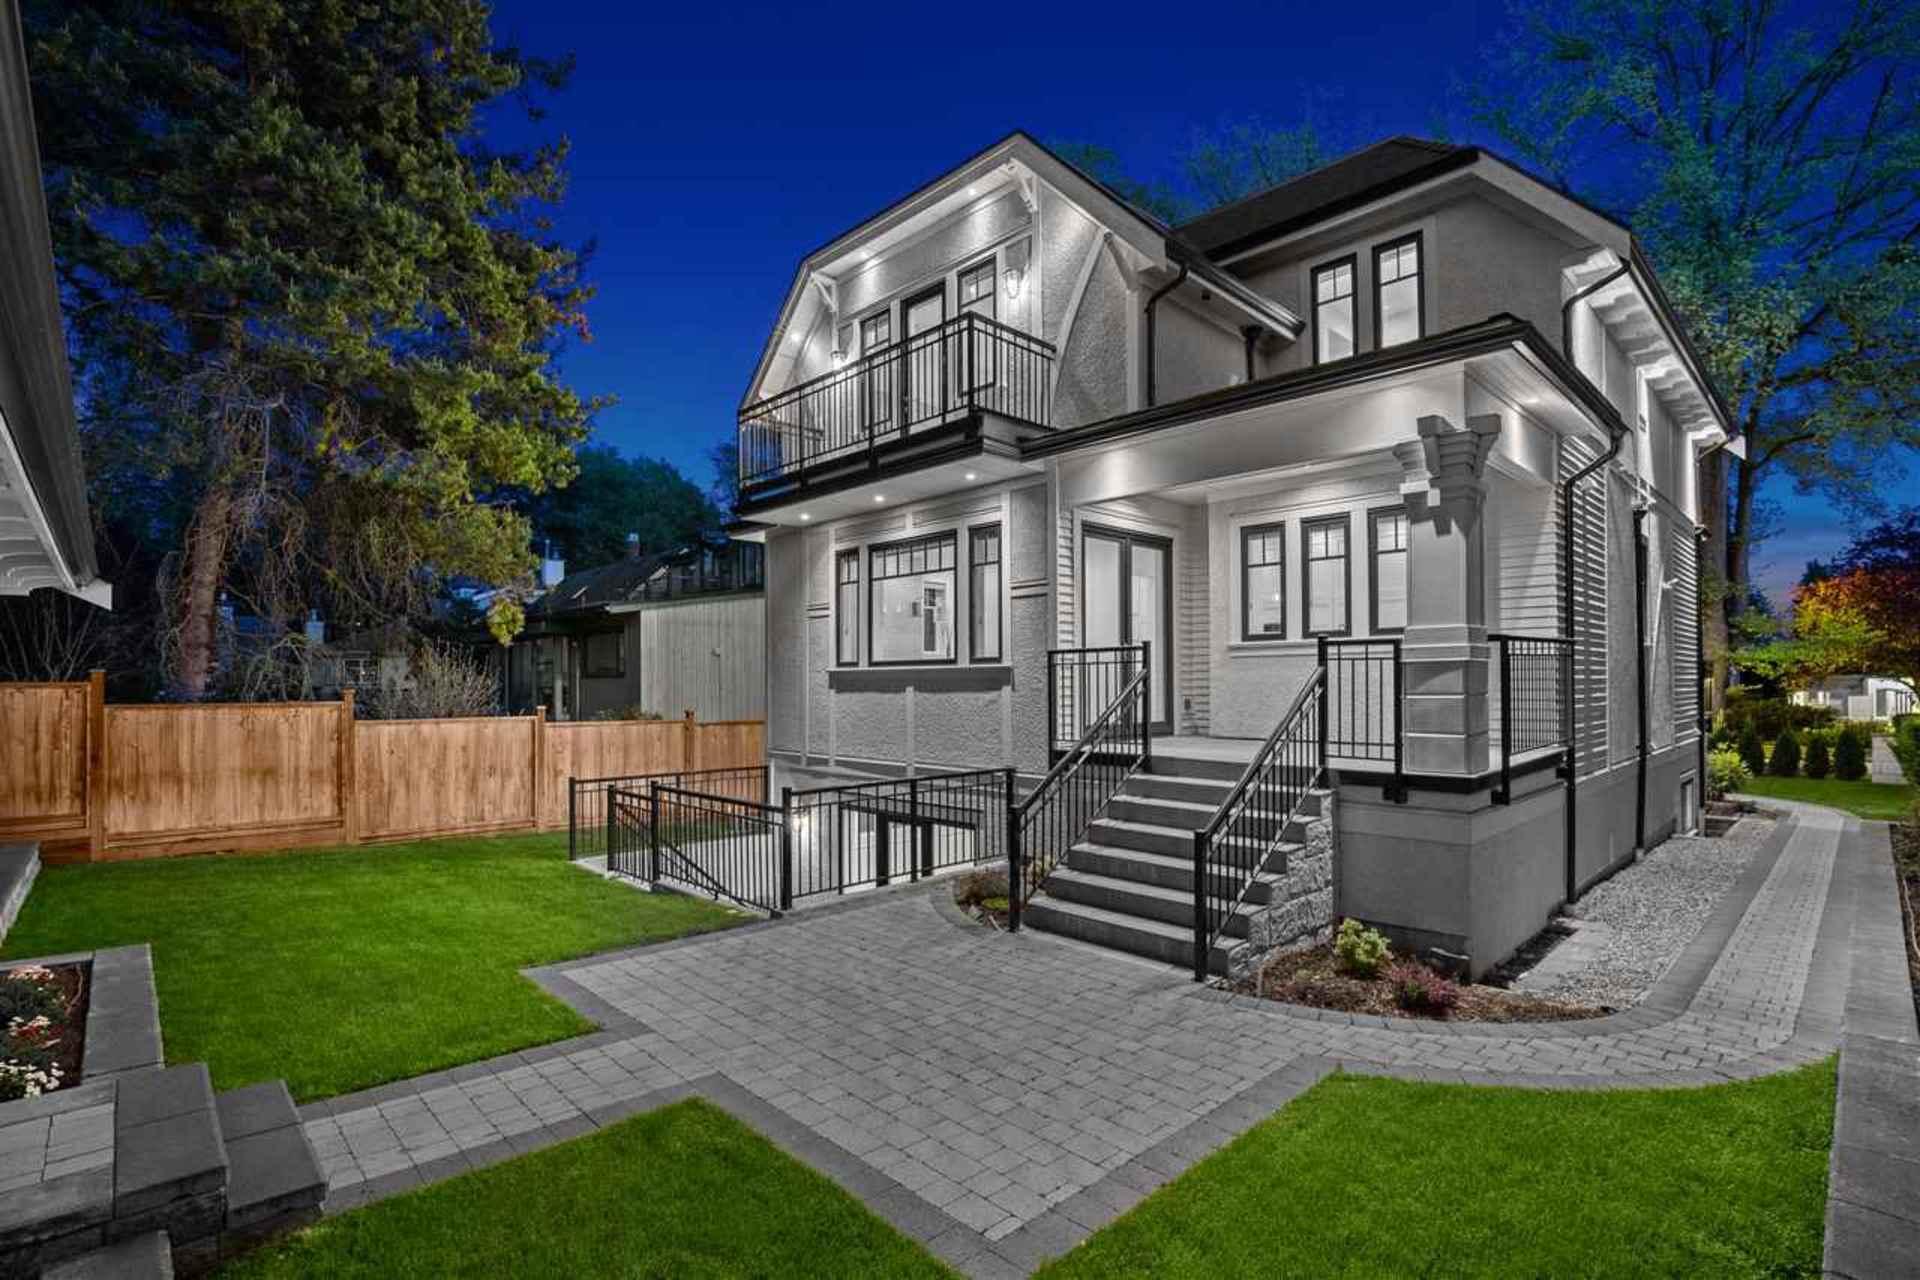 3707-w-37th-avenue-dunbar-vancouver-west-39 at 3707 W 37th Avenue, Dunbar, Vancouver West